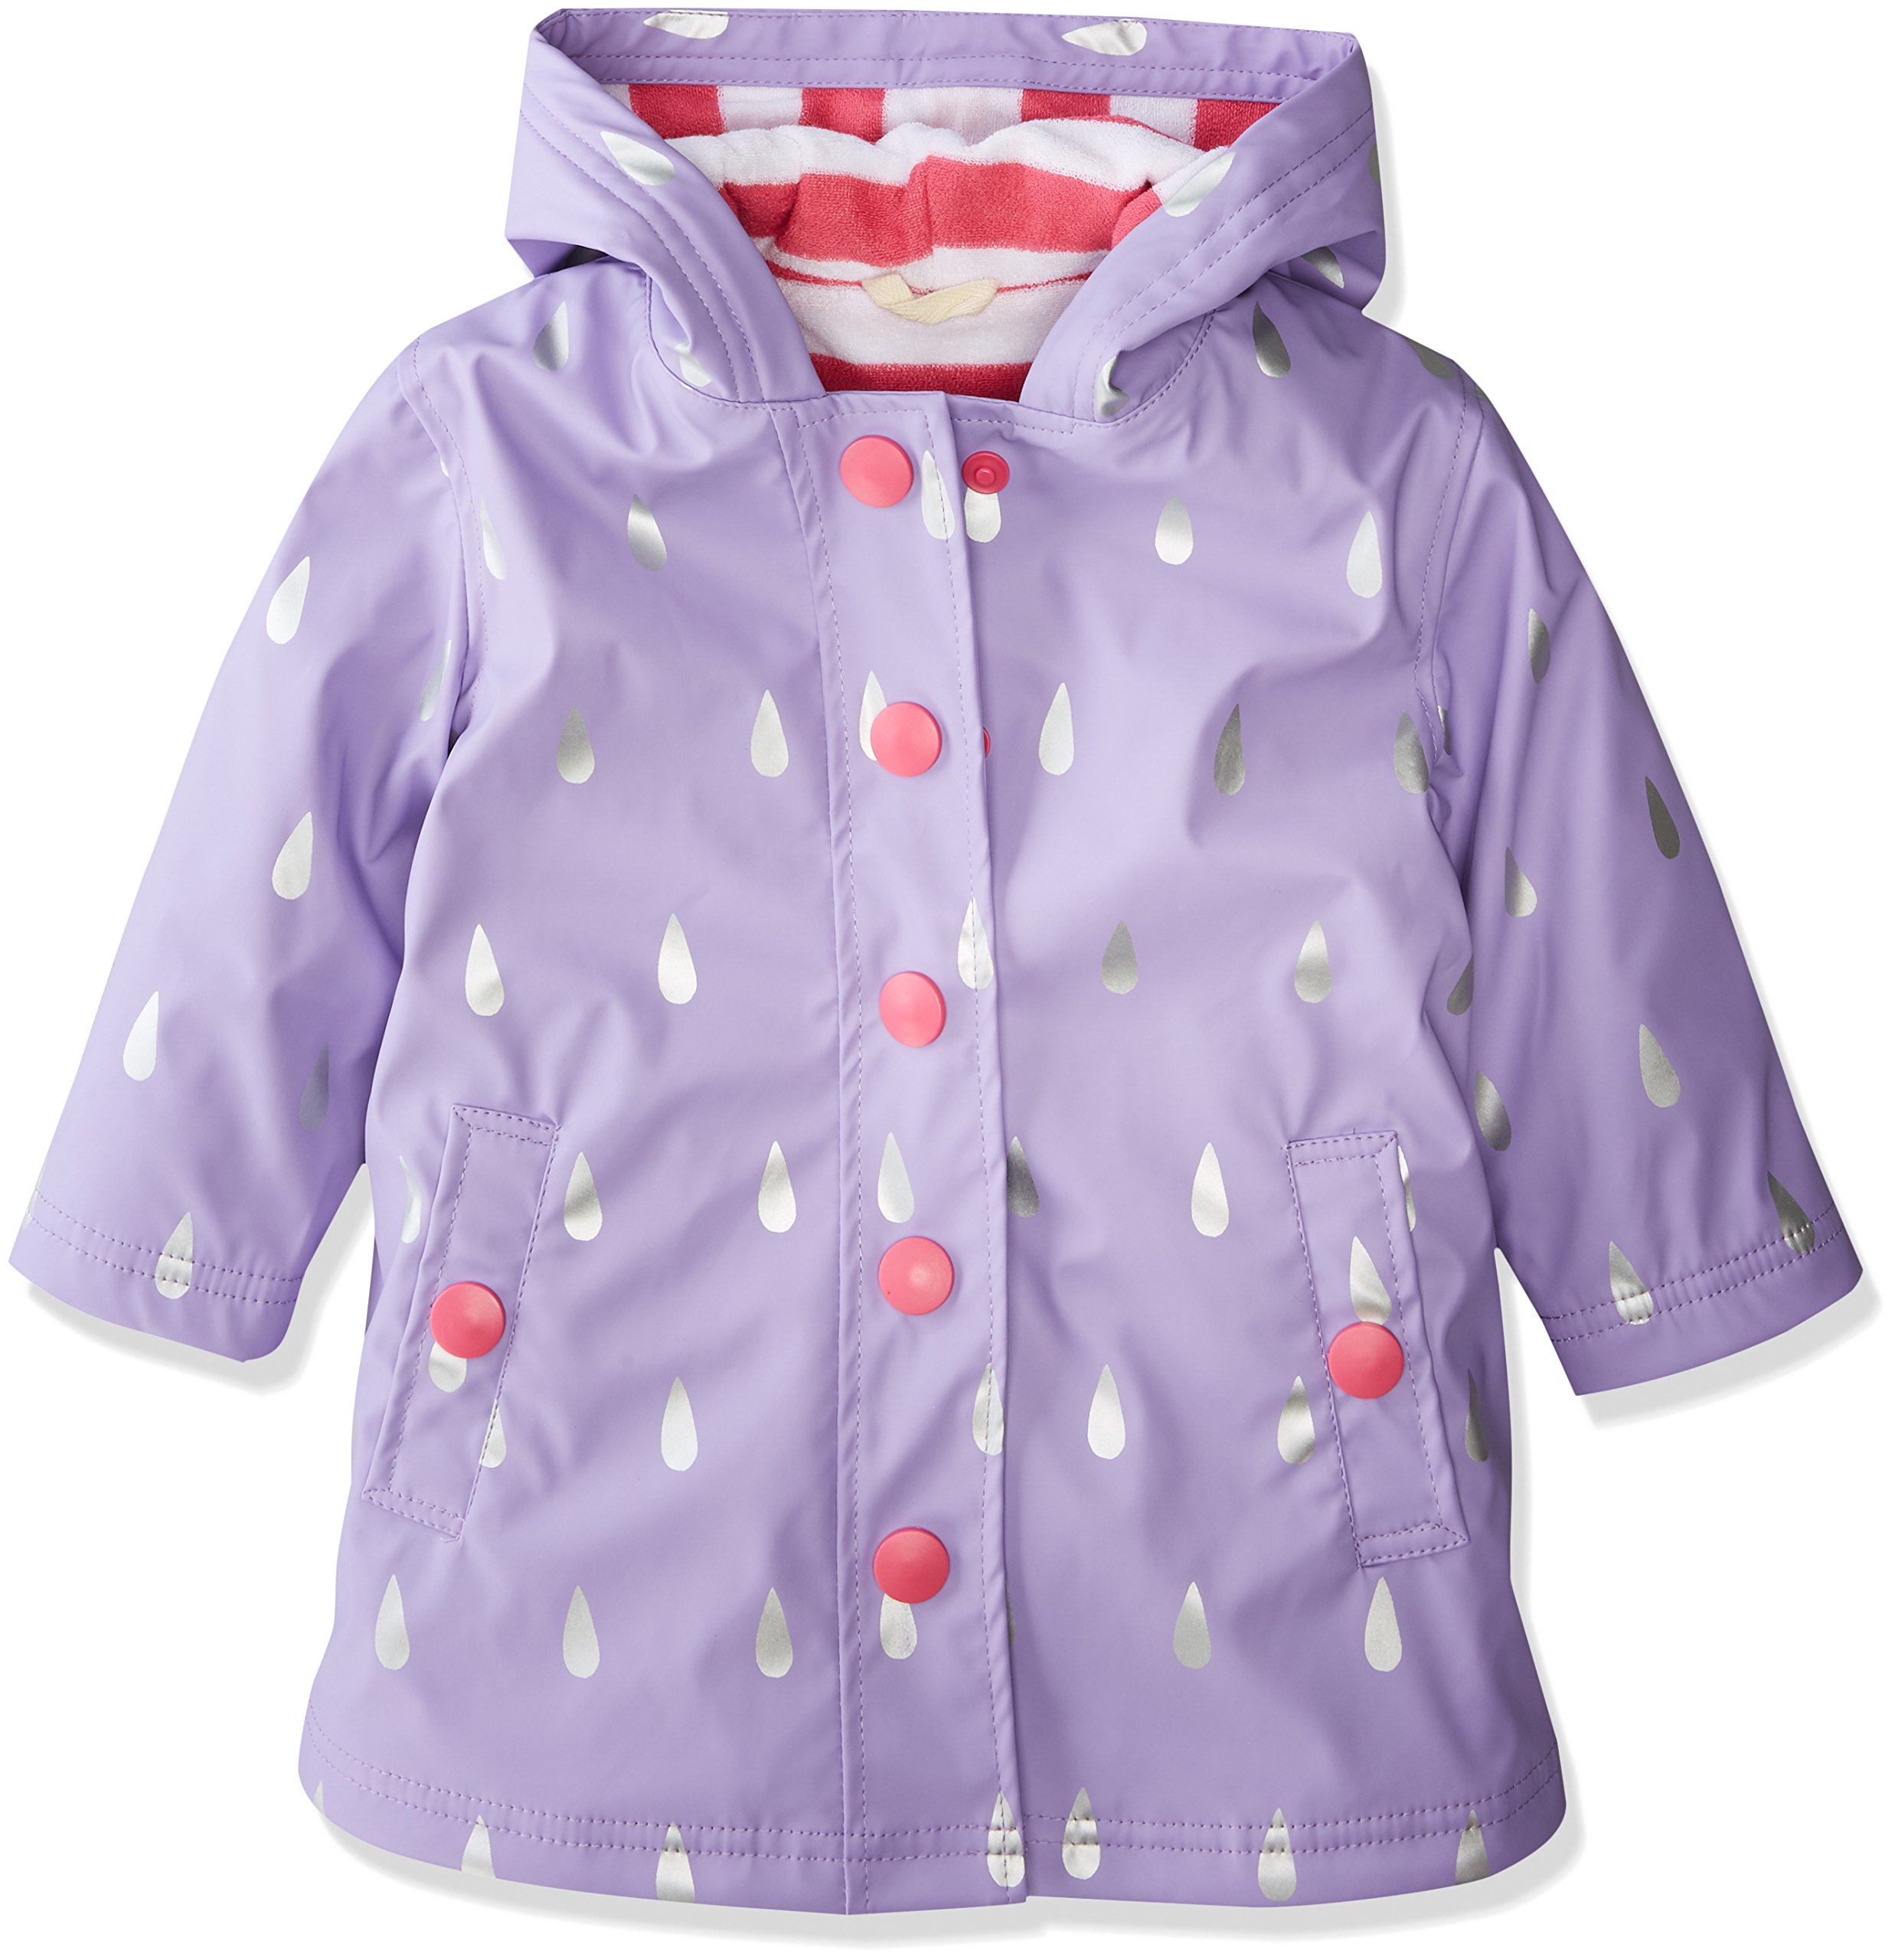 45d50907f4cf Galleon - Hatley Girls  Big Splash Jackets